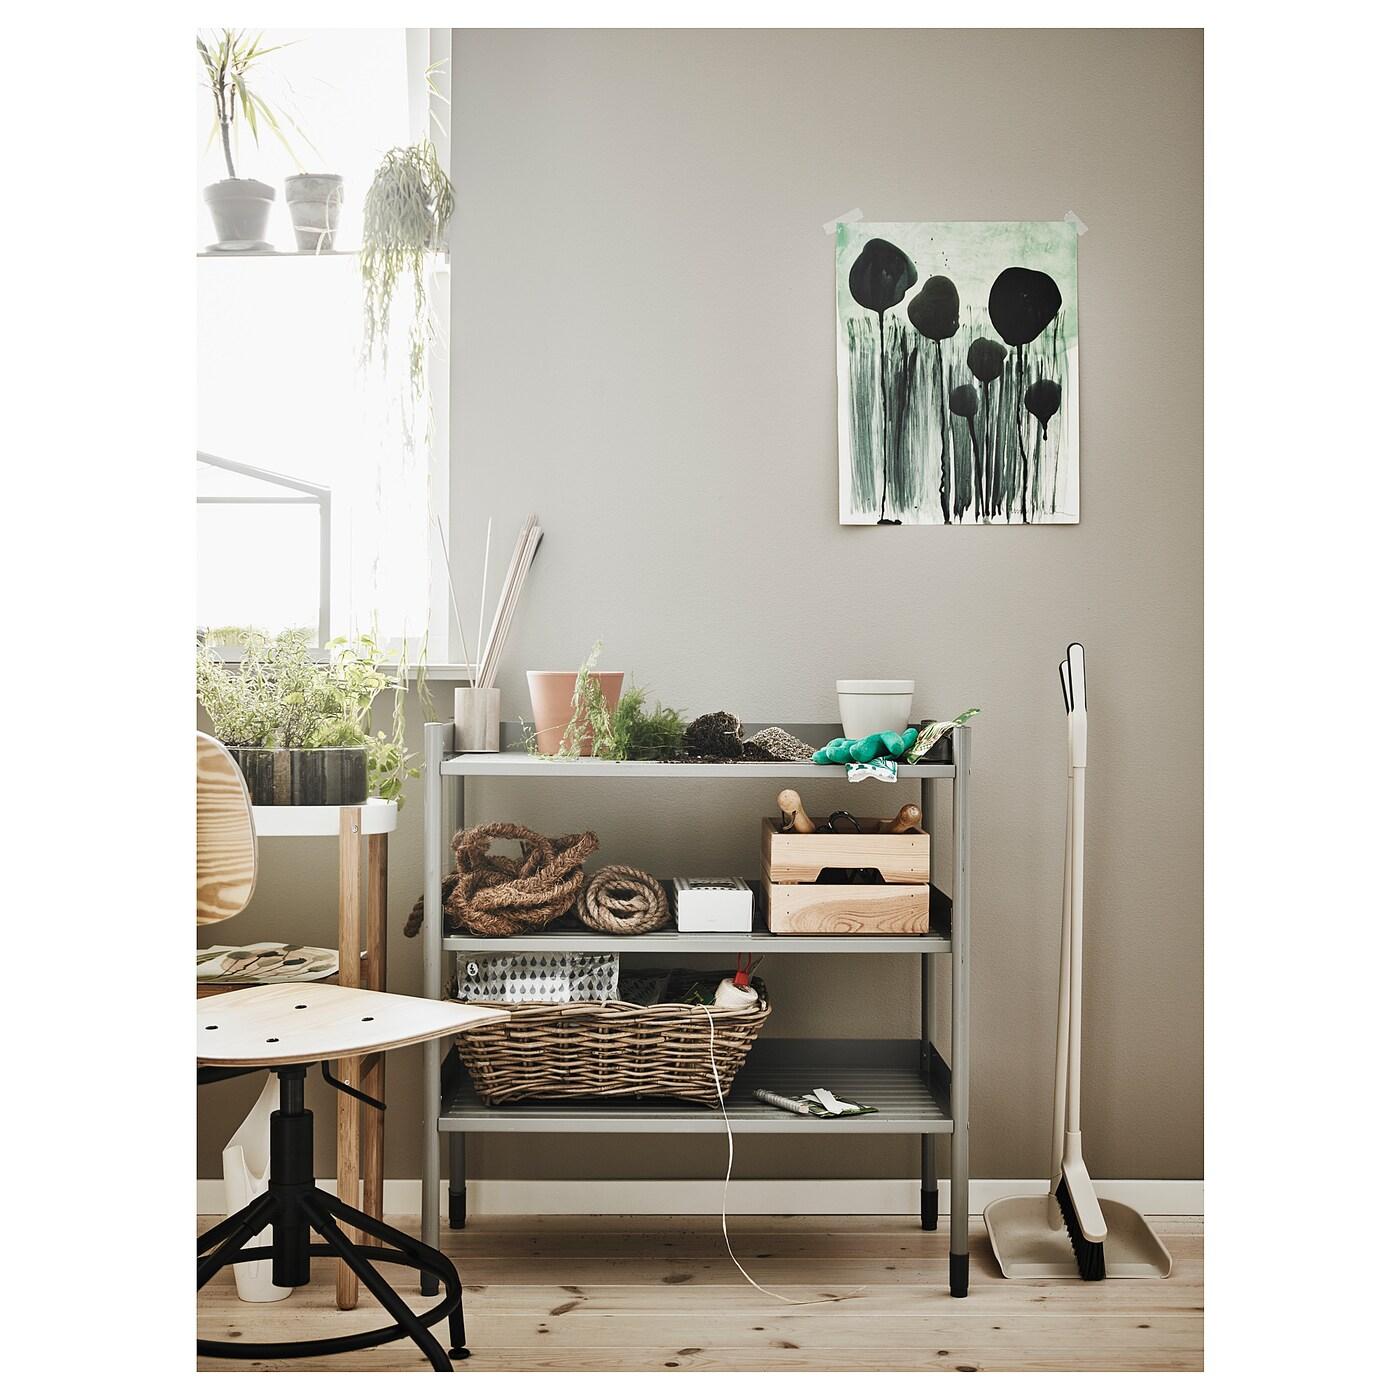 hind tag re int rieur ext rieur gris 78x82 cm ikea. Black Bedroom Furniture Sets. Home Design Ideas